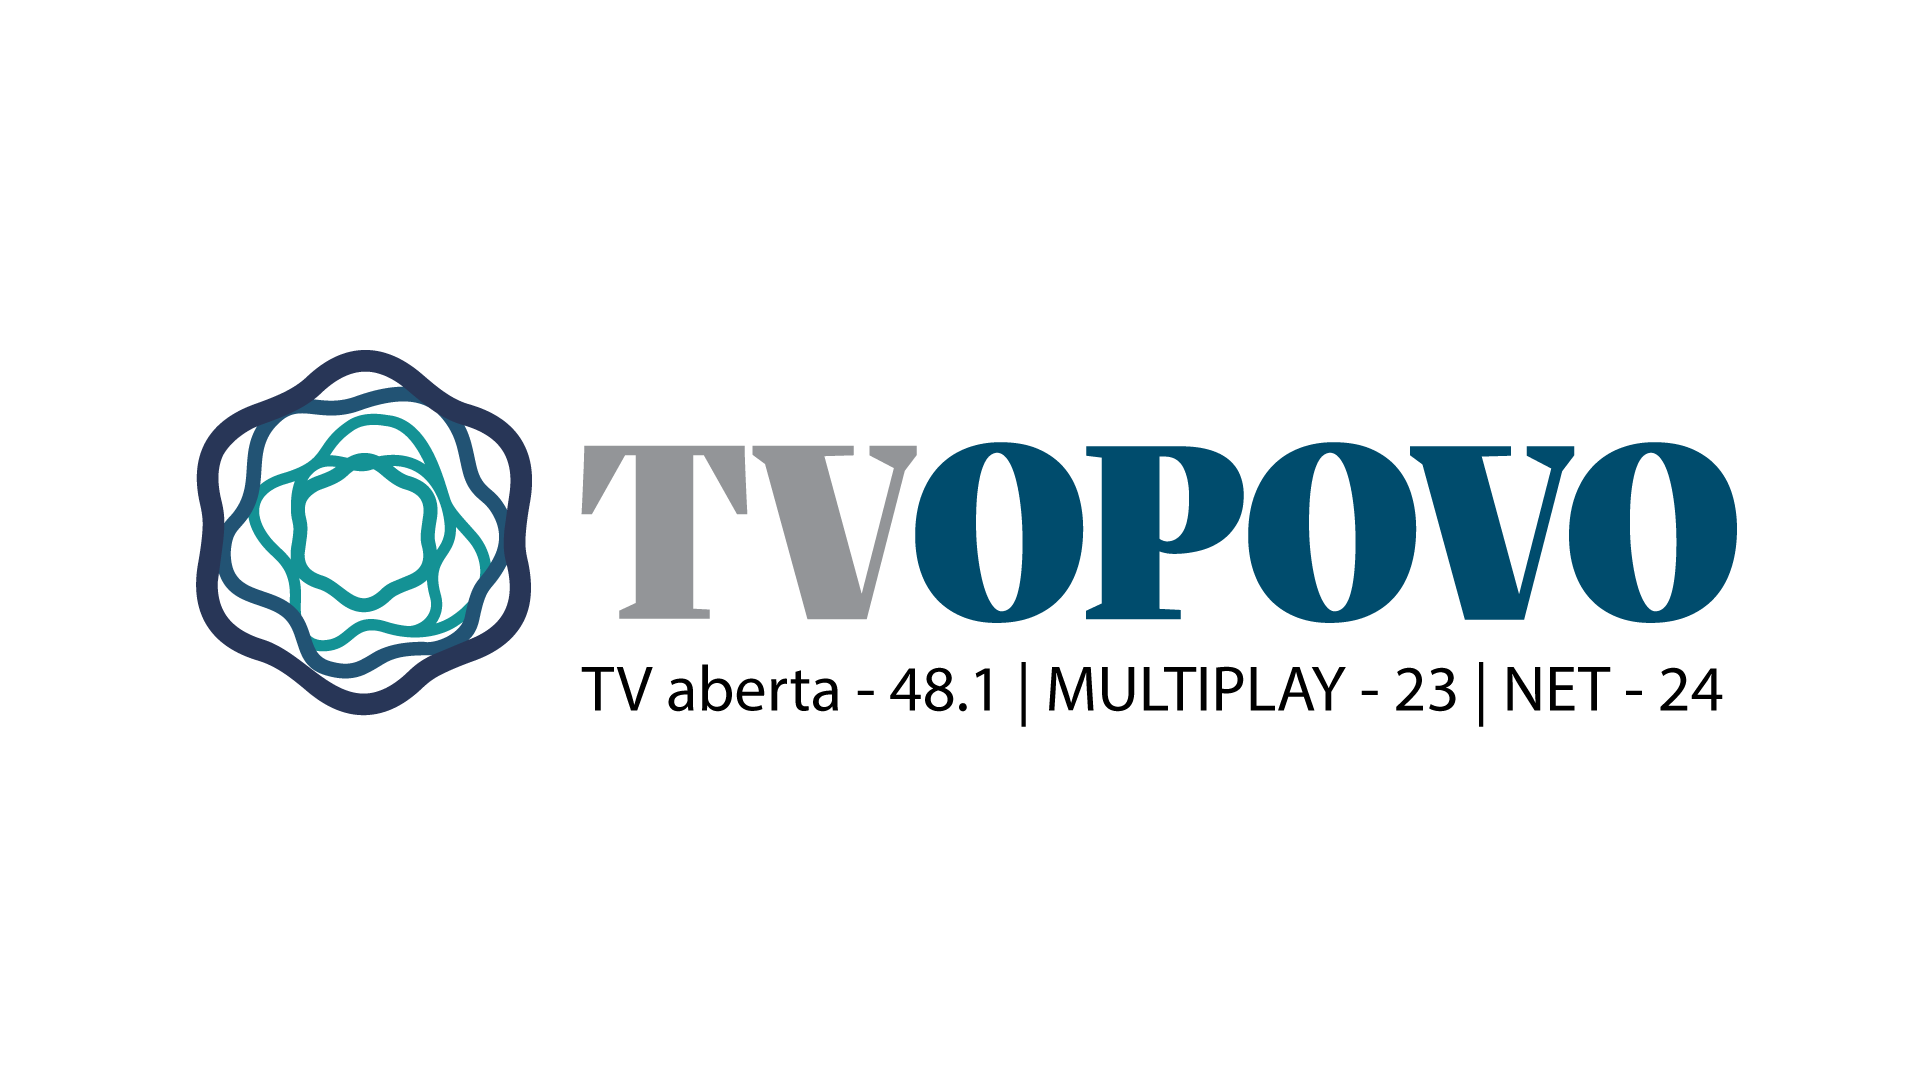 Profil TV O Povo Kanal Tv